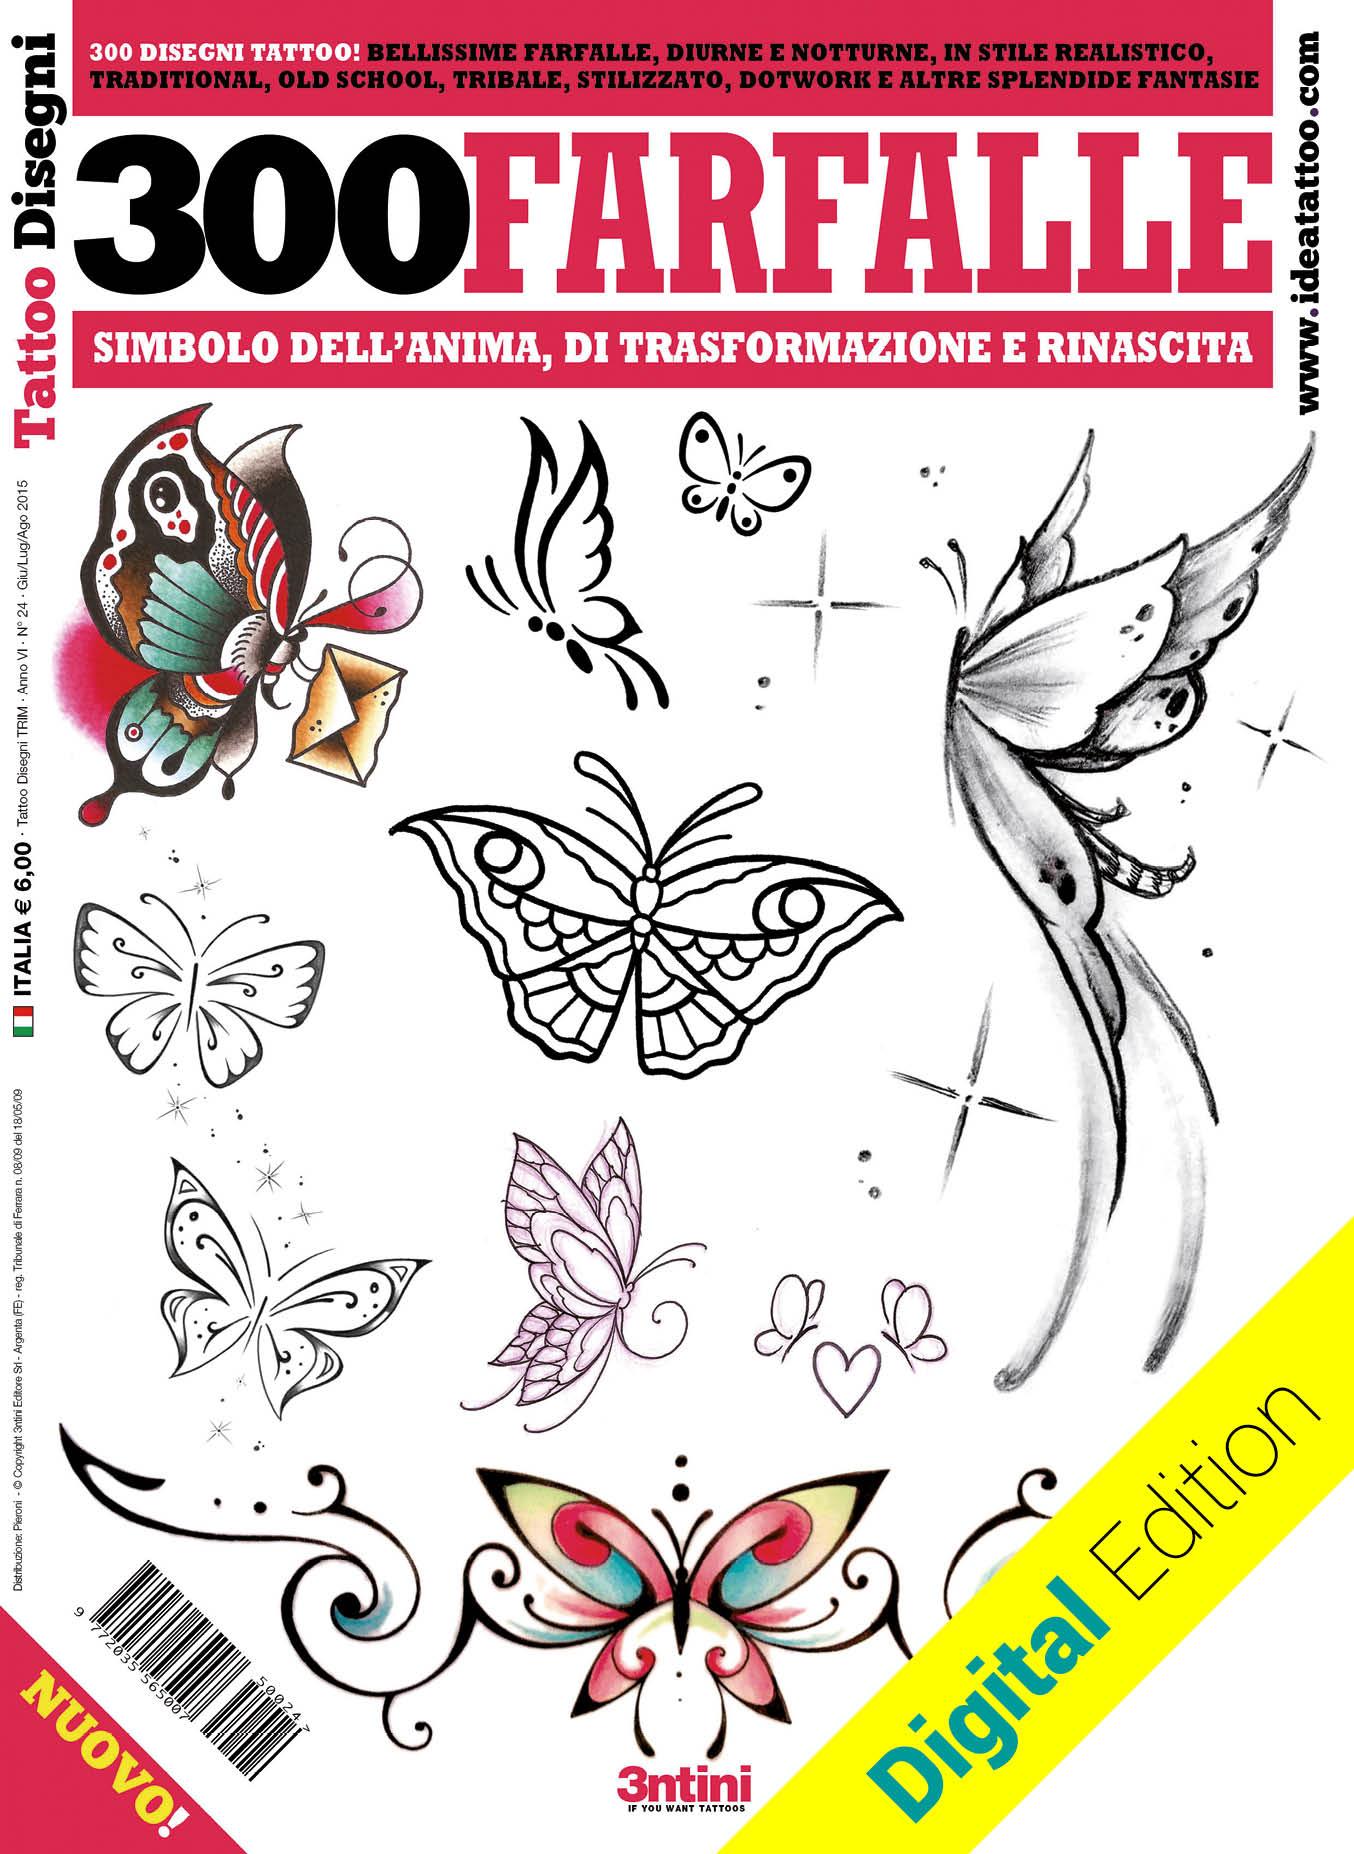 300 farfalle tattoo cover dig 1 Disegni Tattoo   Farfalle